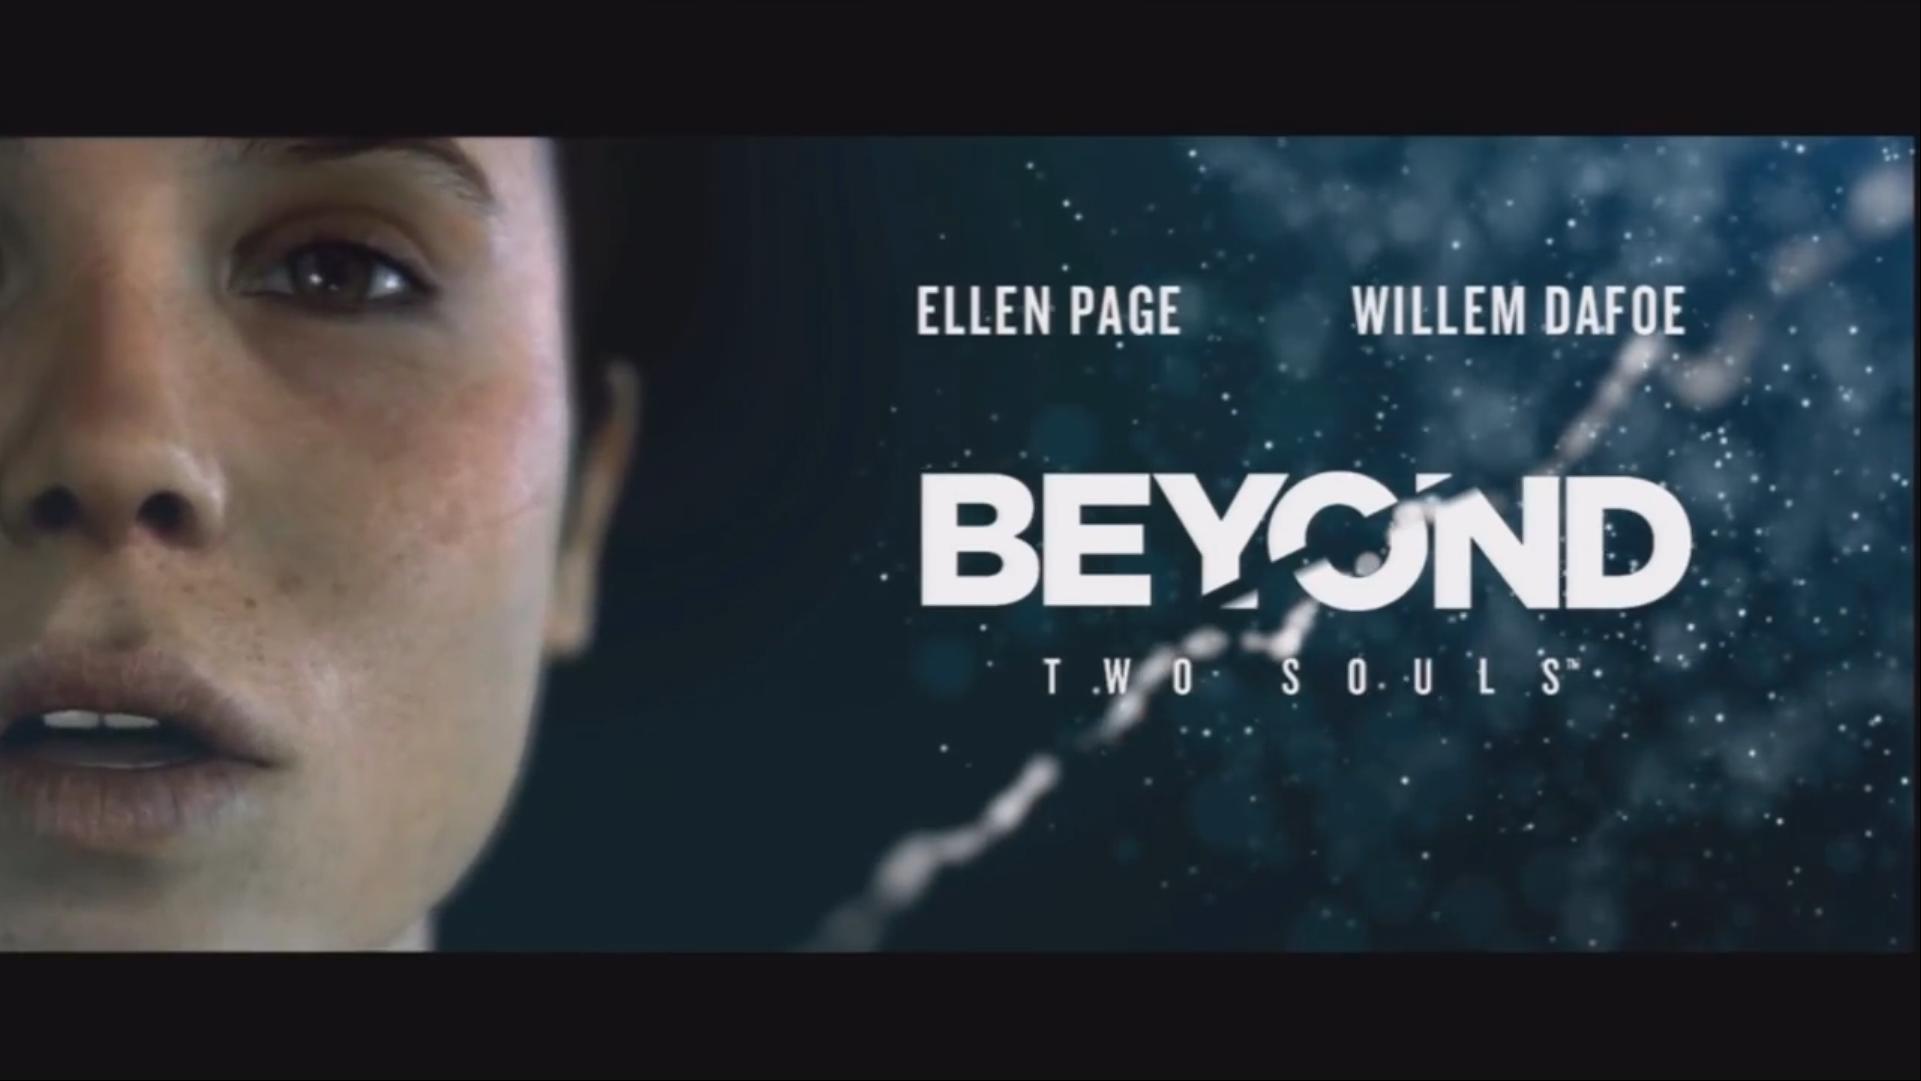 Скриншот 28-03-2016 093440.png - Beyond: Two Souls